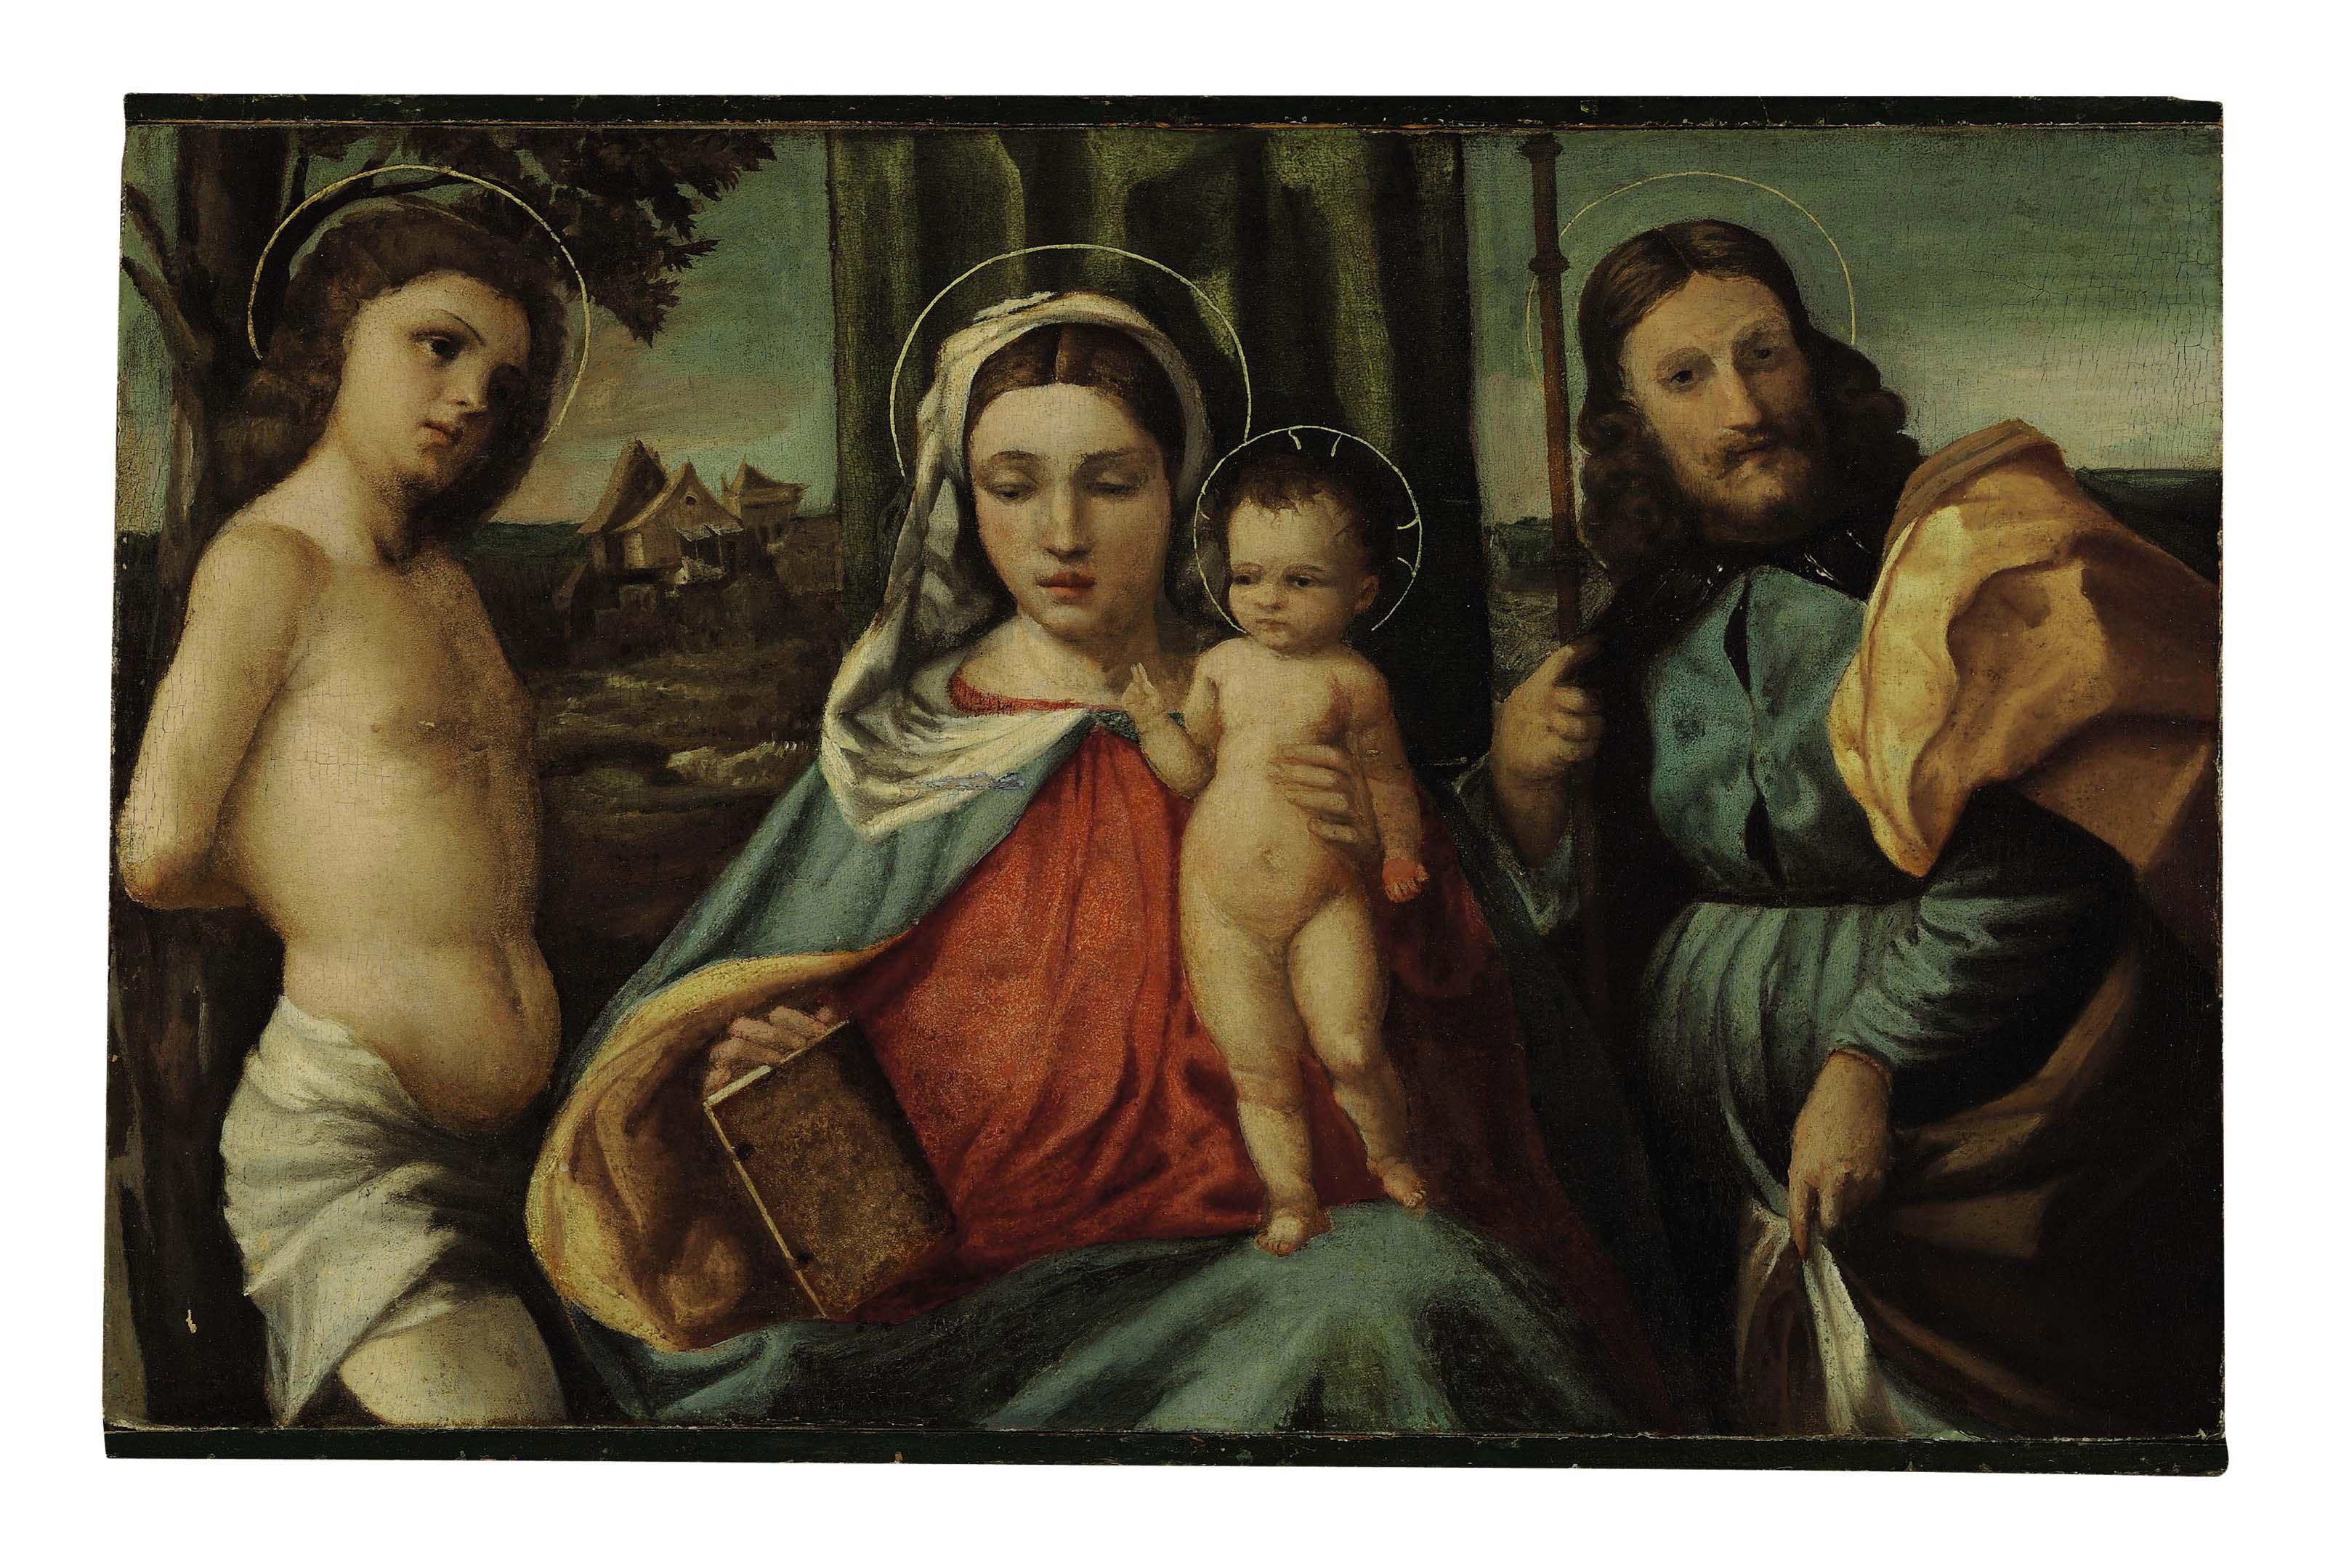 North Italian School, c. 1510